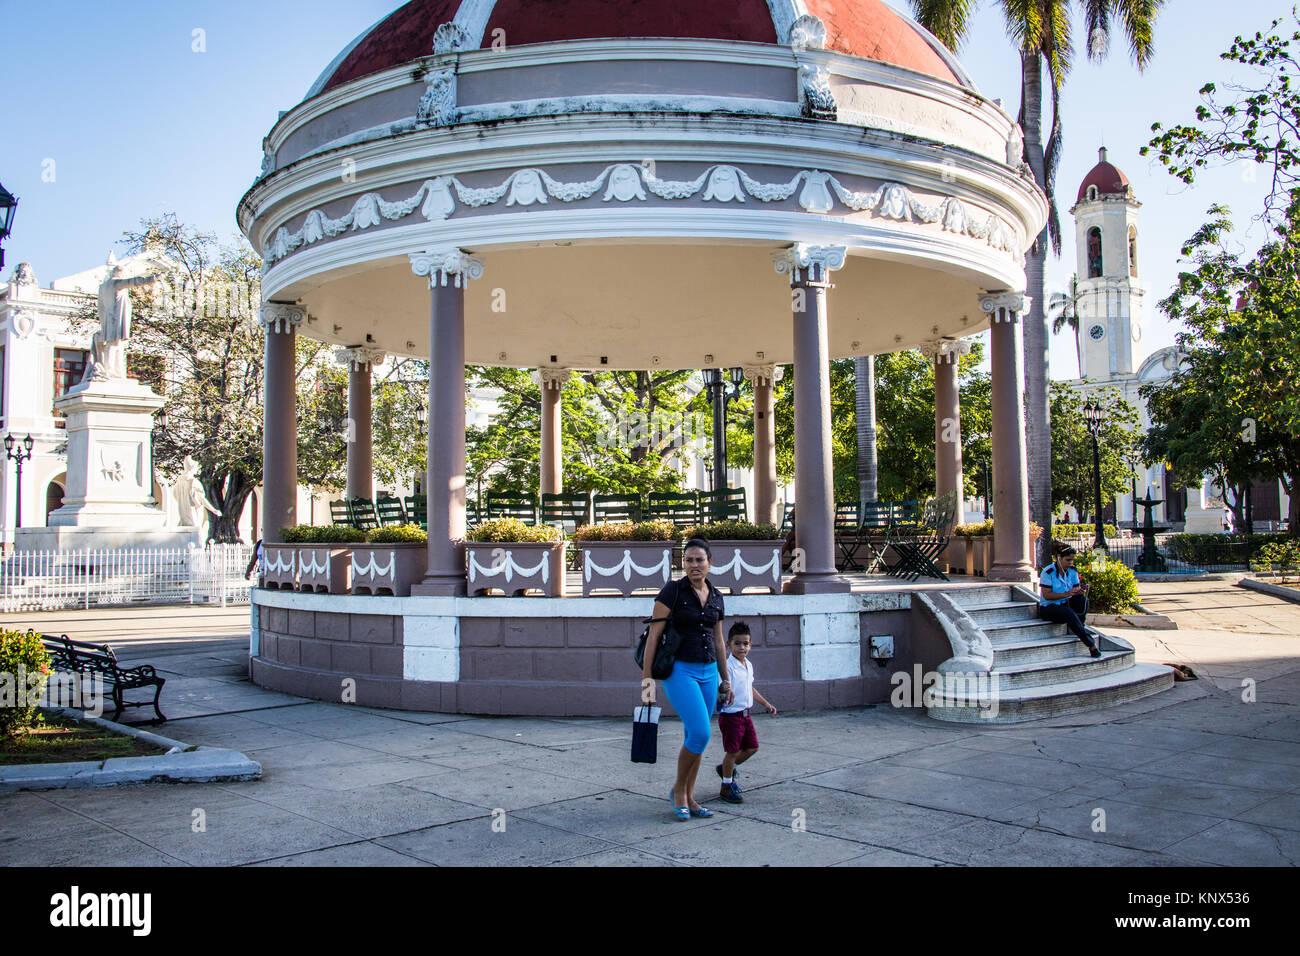 Pavilion, Parque Jose Marti, historic city centre, Cienfuegos, Cuba - Stock Image